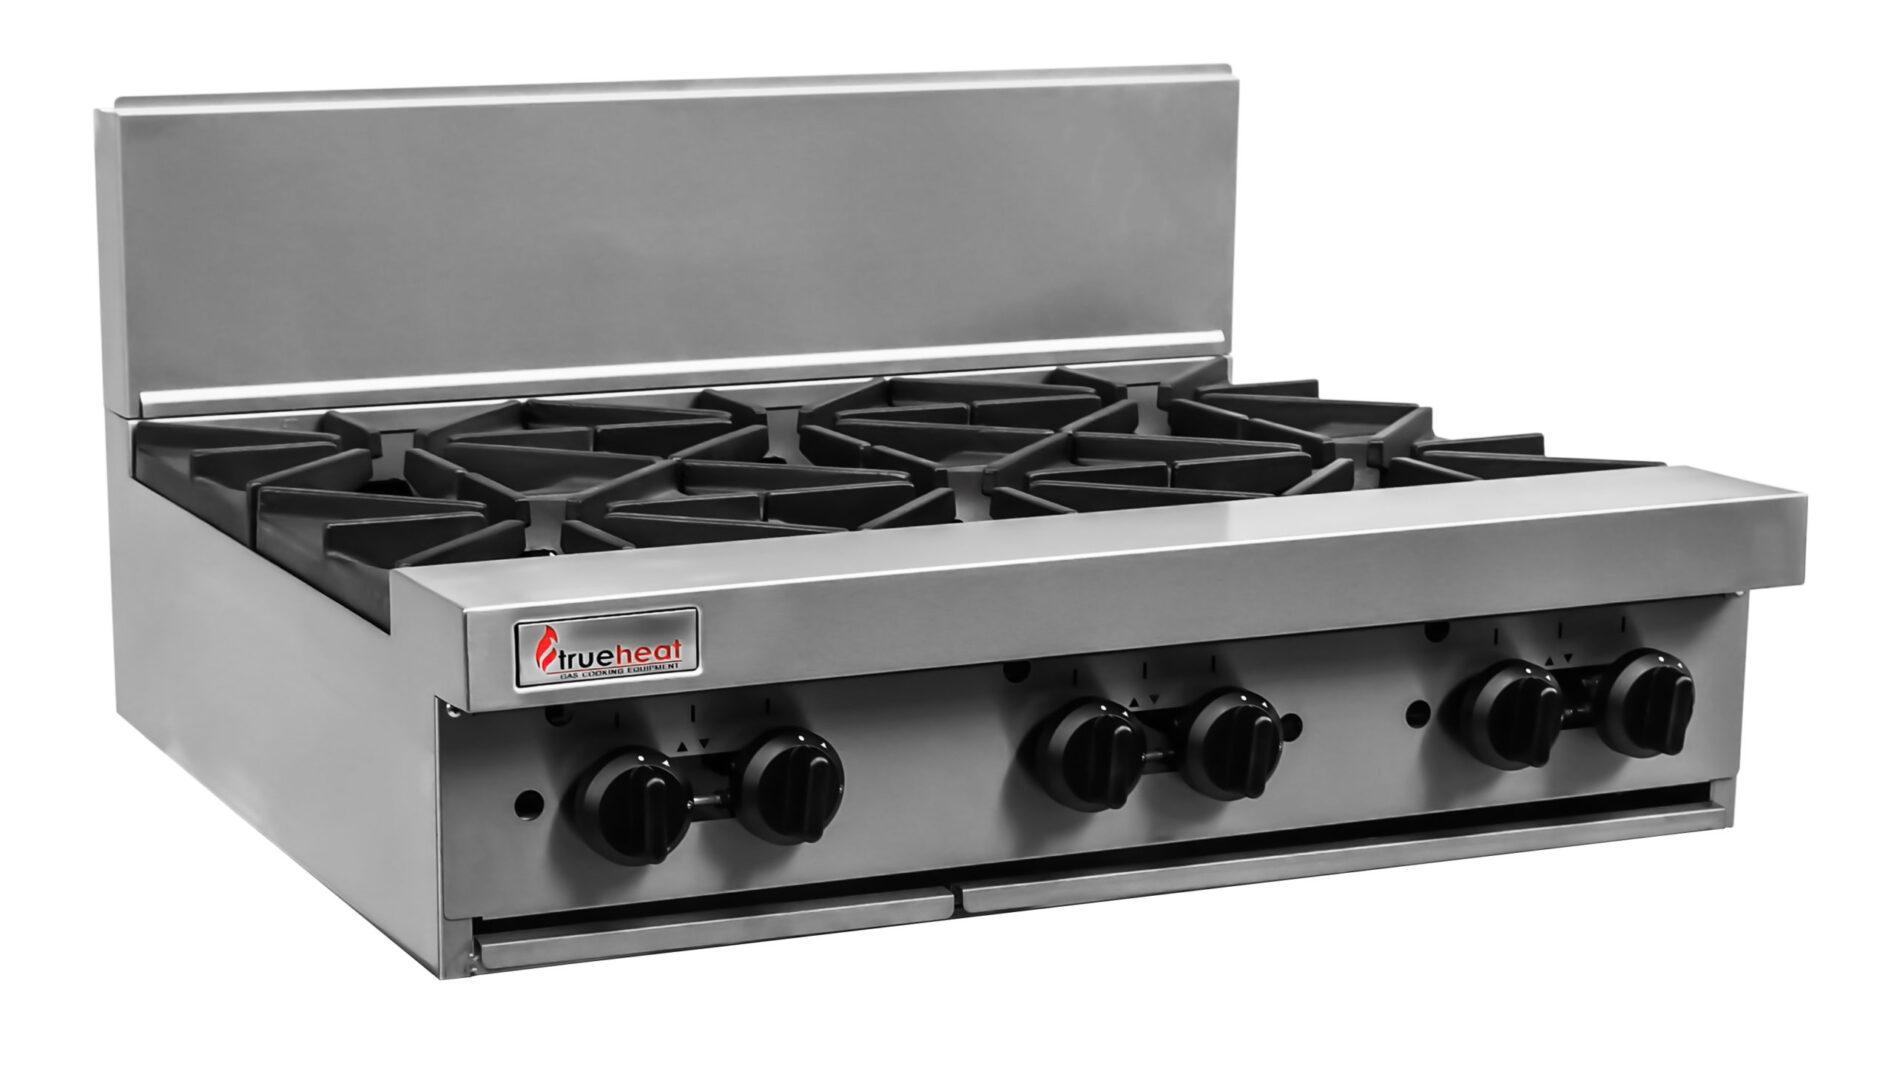 Trueheat RC Series 900mm Top W 6 Burners NG